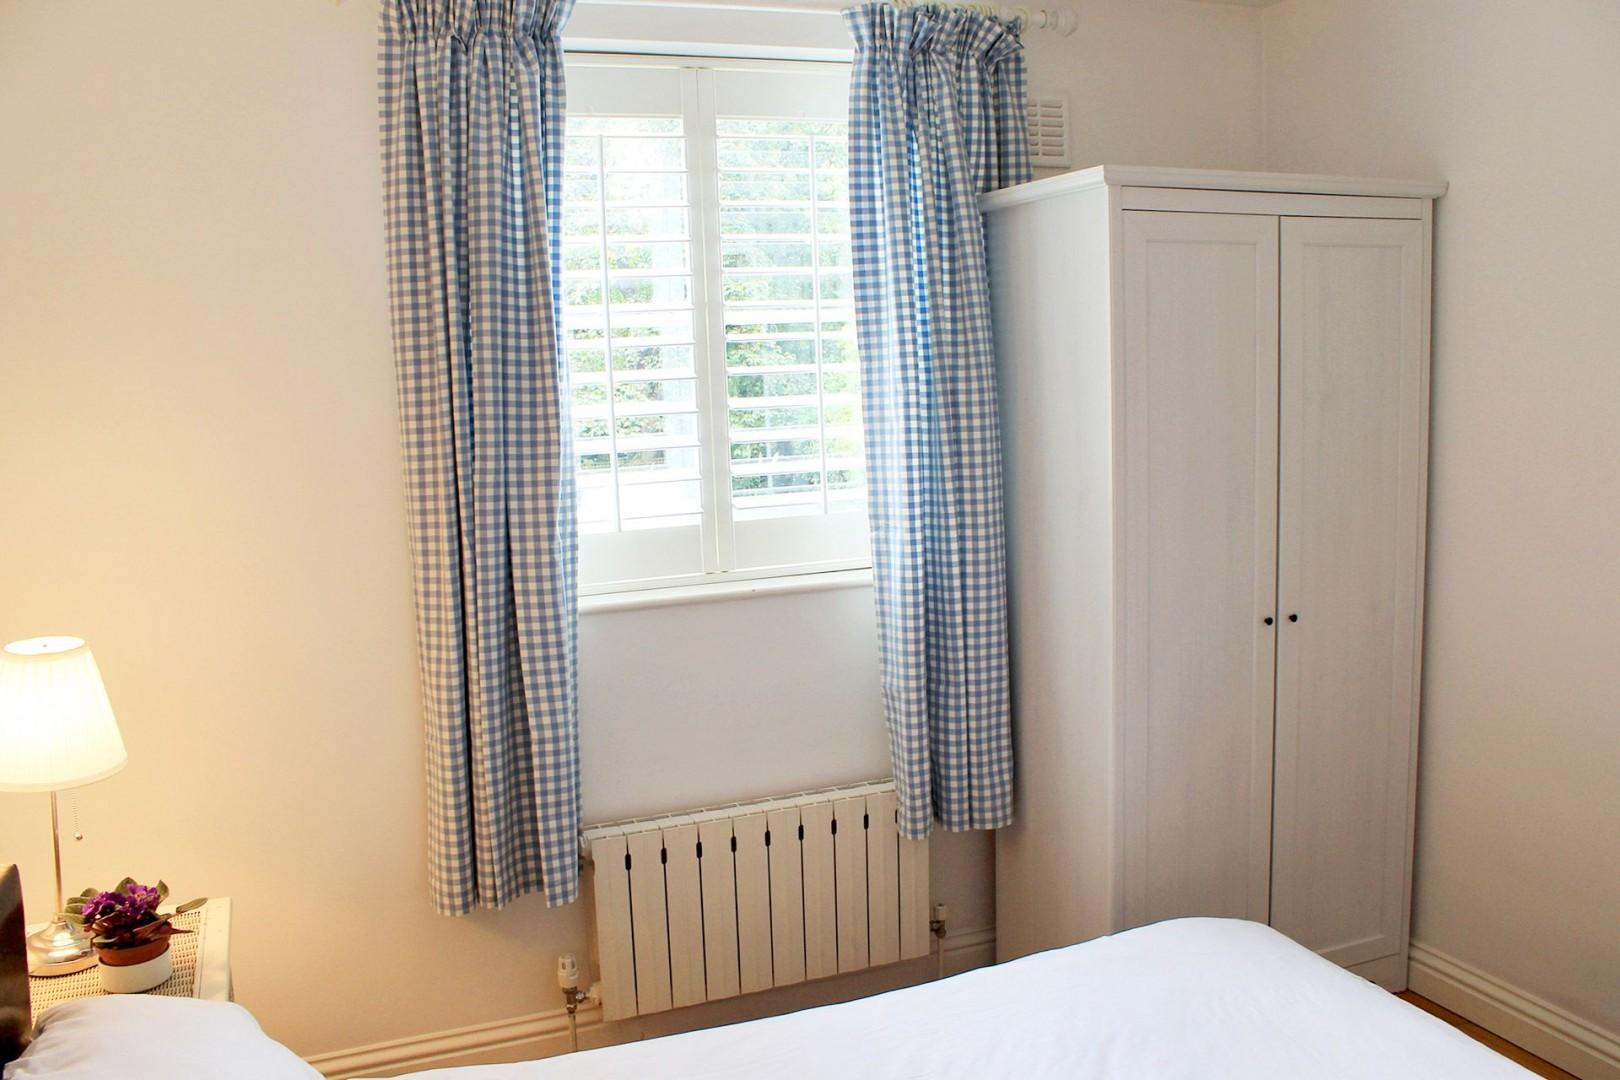 Pack away your belongings in the first bedroom cupboard